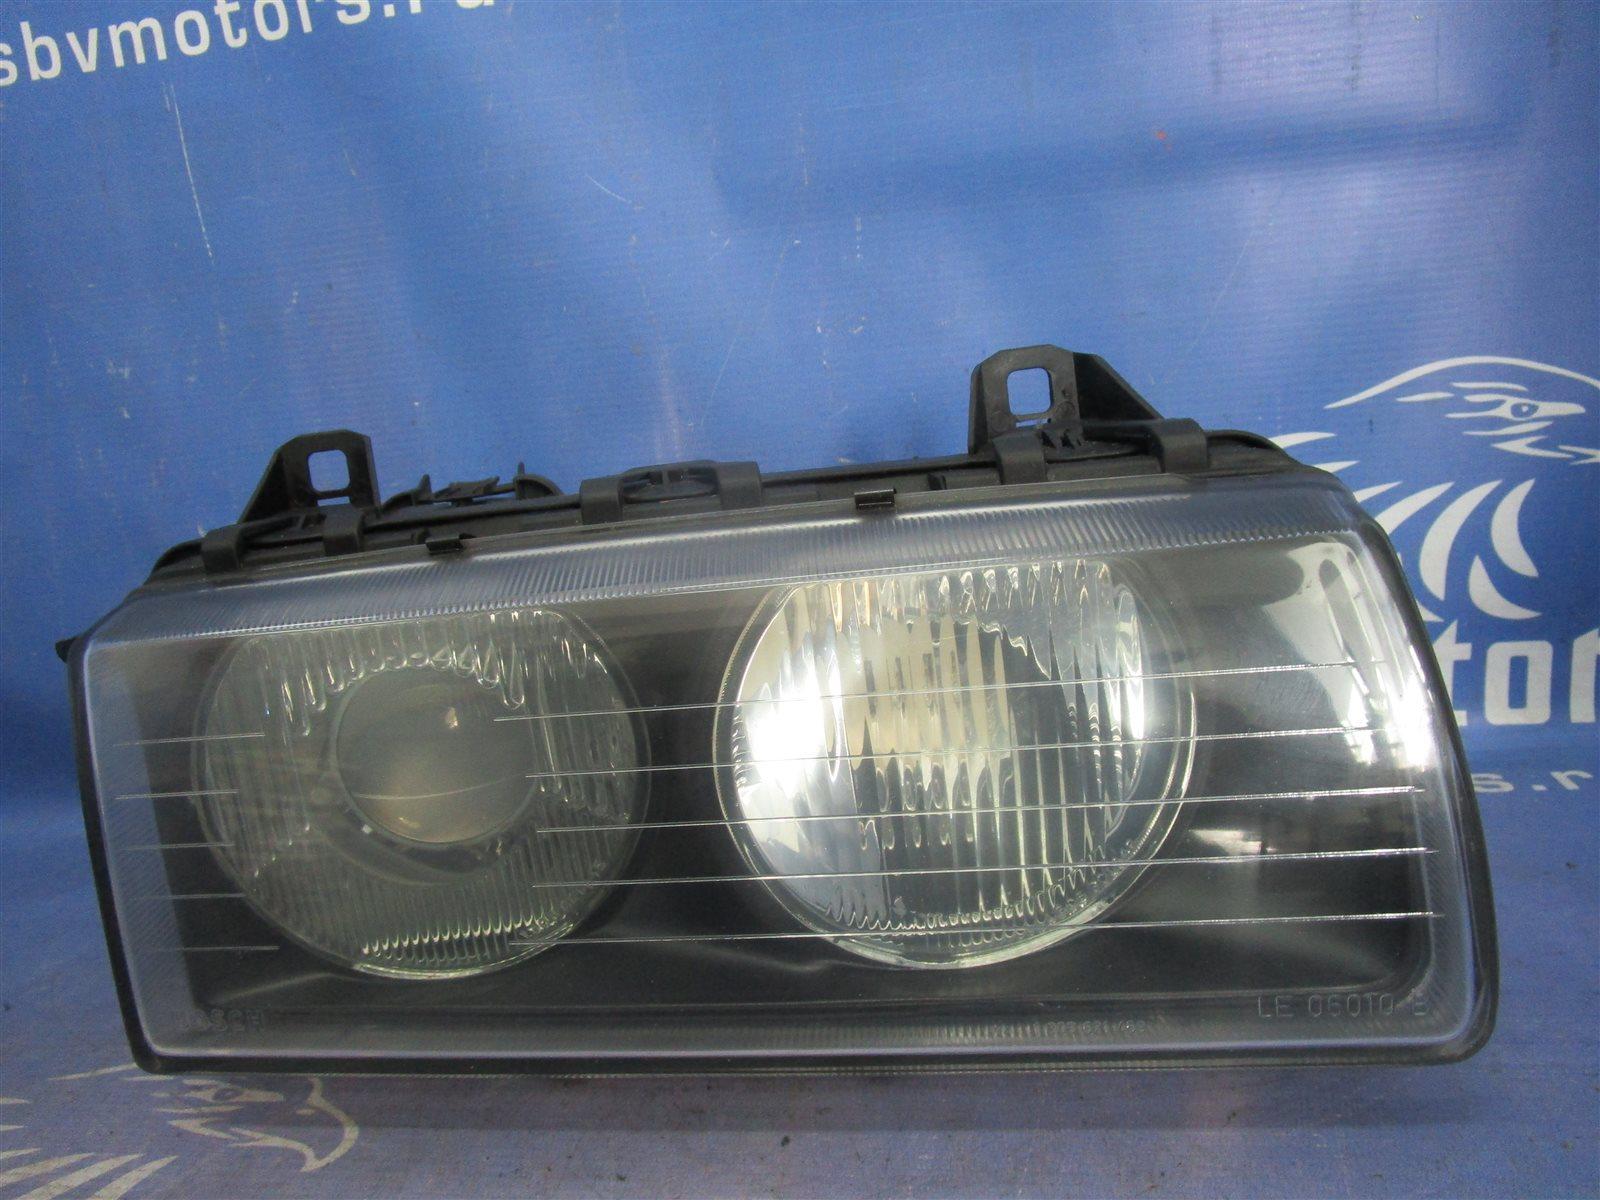 Фара передняя левая BMW 3-series 1994 E36 / E36/2 M50 B25 631283535969 контрактная